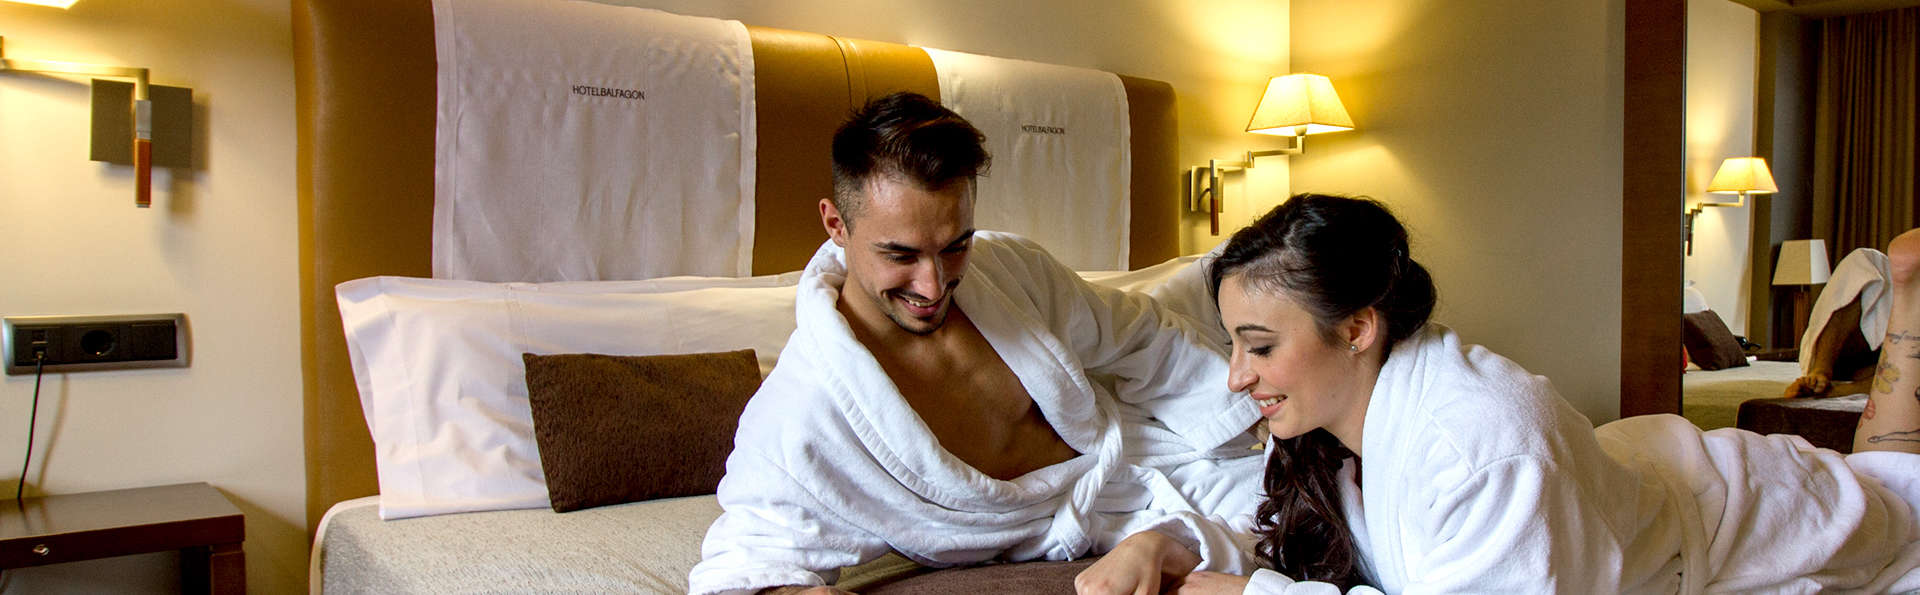 Hotel Spa Balfagón - EDIT_N2_ROOM.jpg